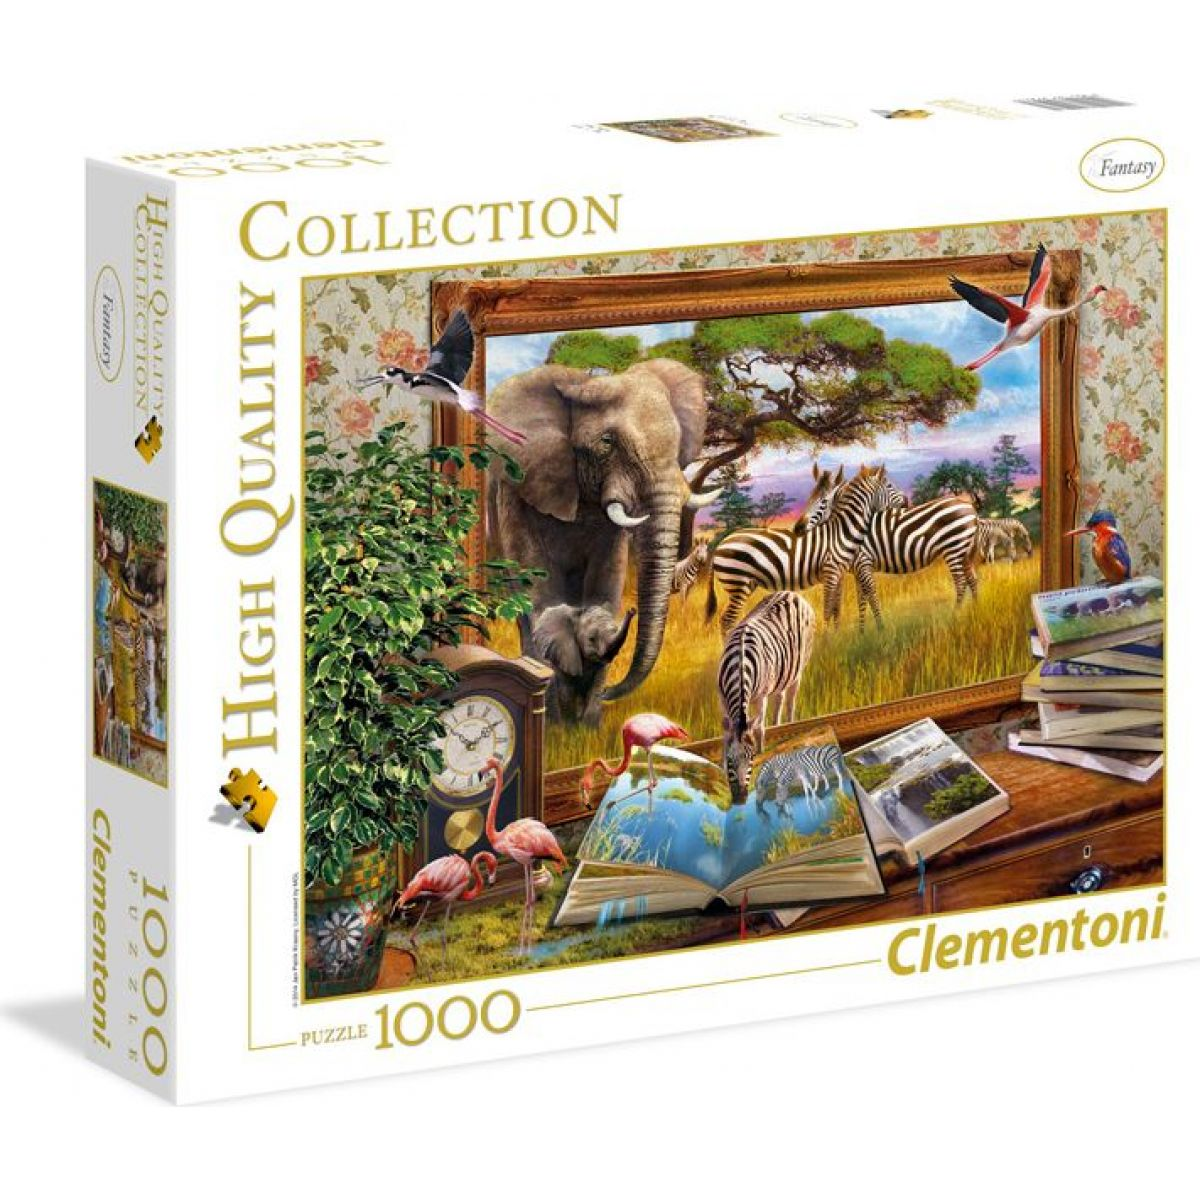 Clementoni Puzzle Come to life 1000d